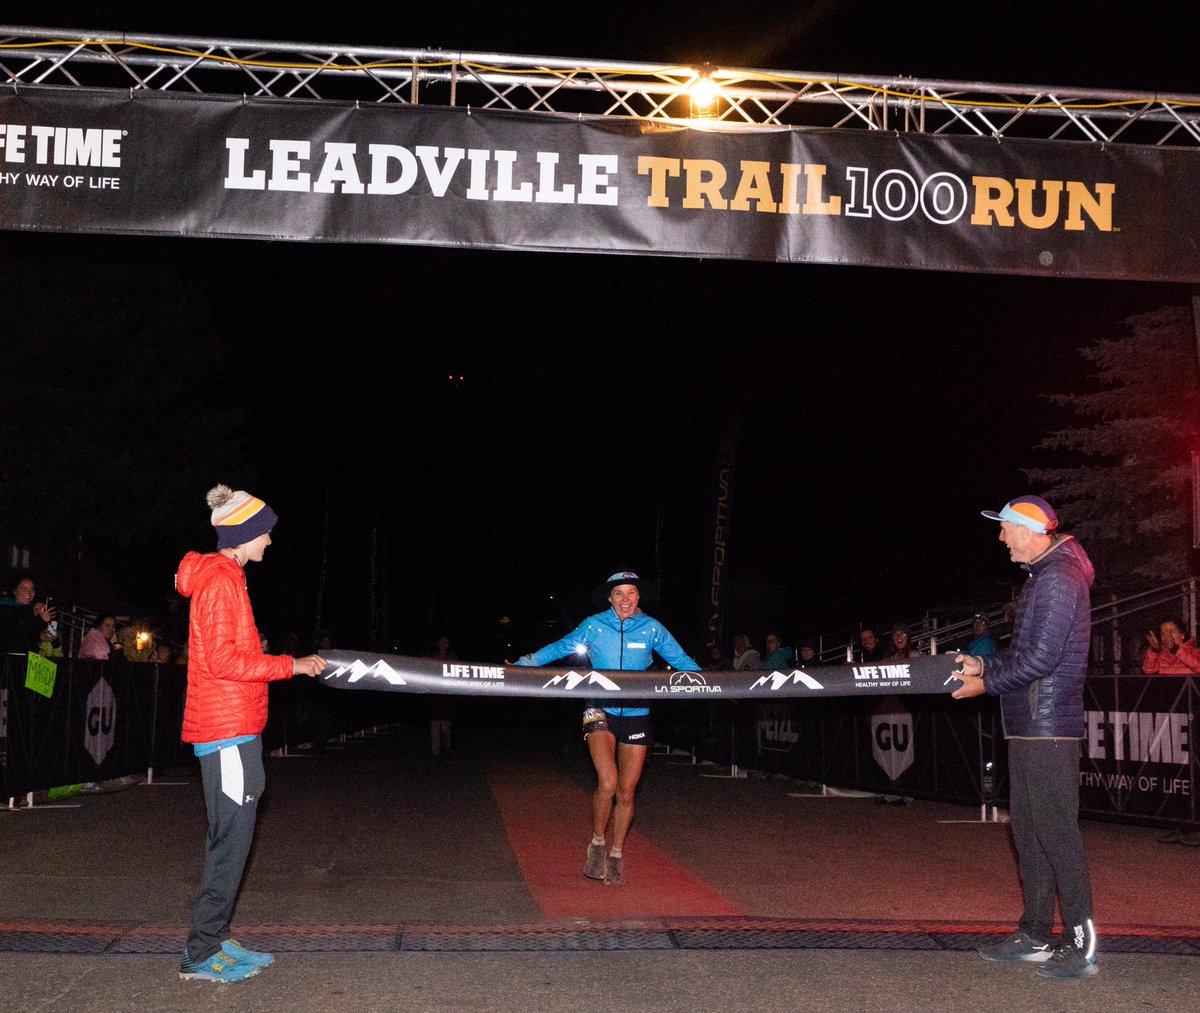 Your Leadville Trail 100 Run Winner! Congratulations, @RunBoulet! We are so proud of you! #GUFORIT #LT100Run